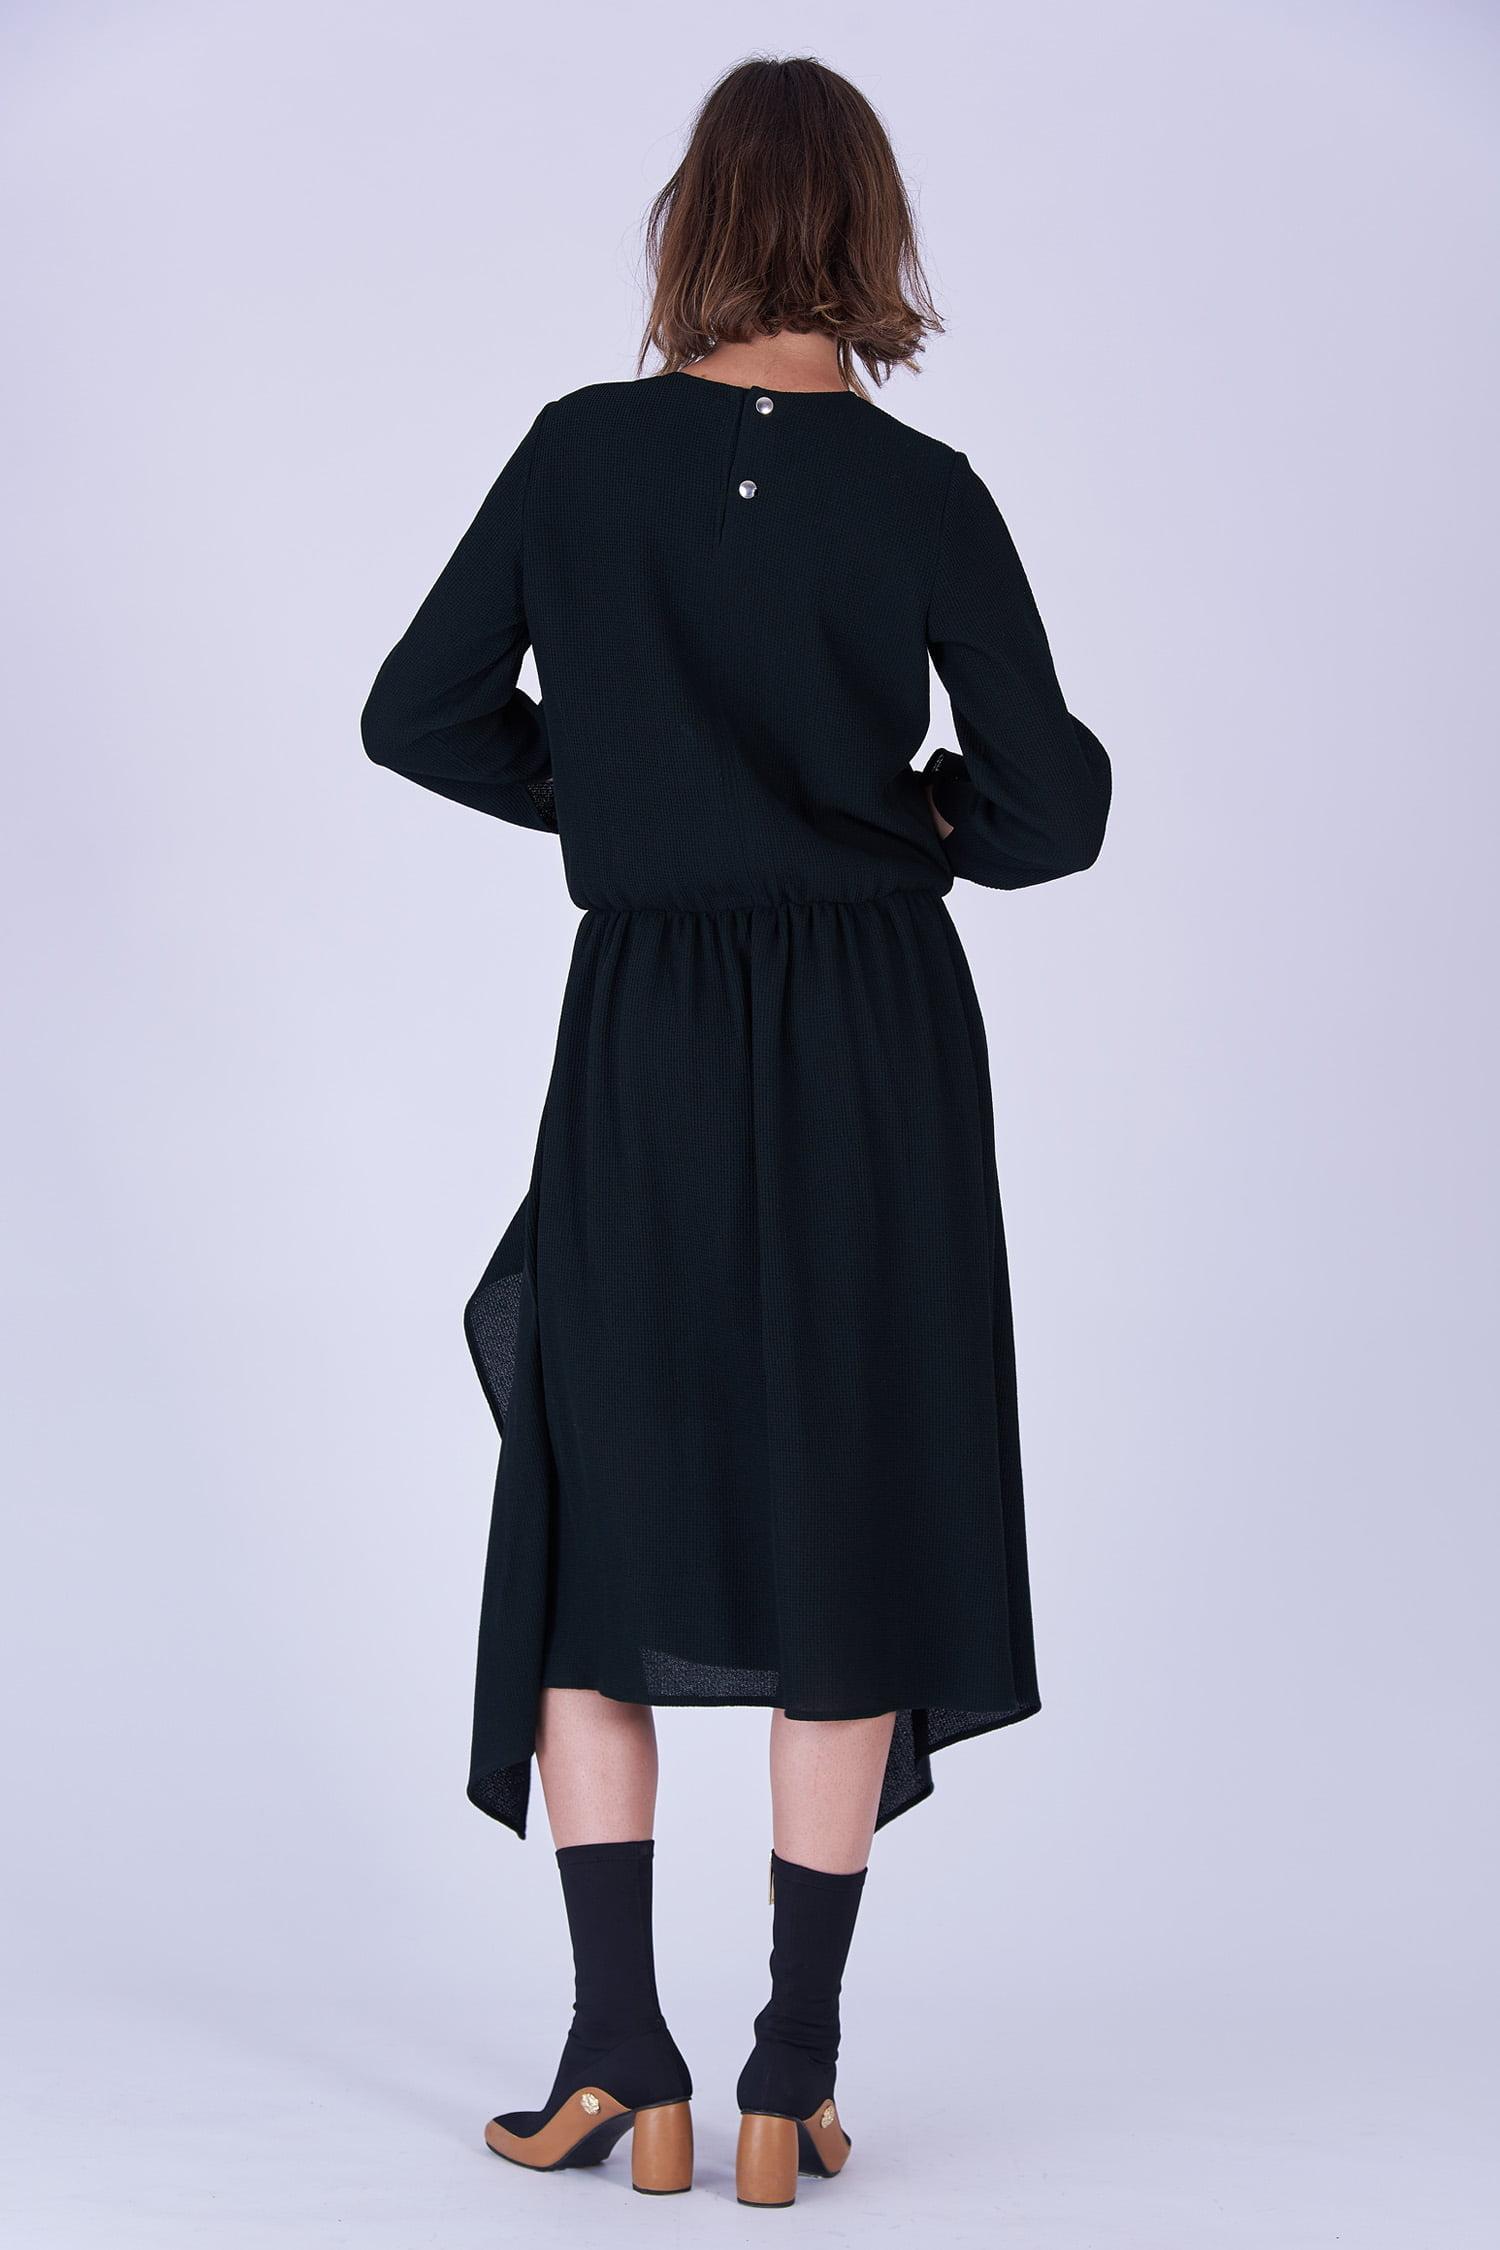 Acephala Fw19 20 Black Midi Draped Woolen Dress Czarna Sukienka Welniana Drapowana Back 1